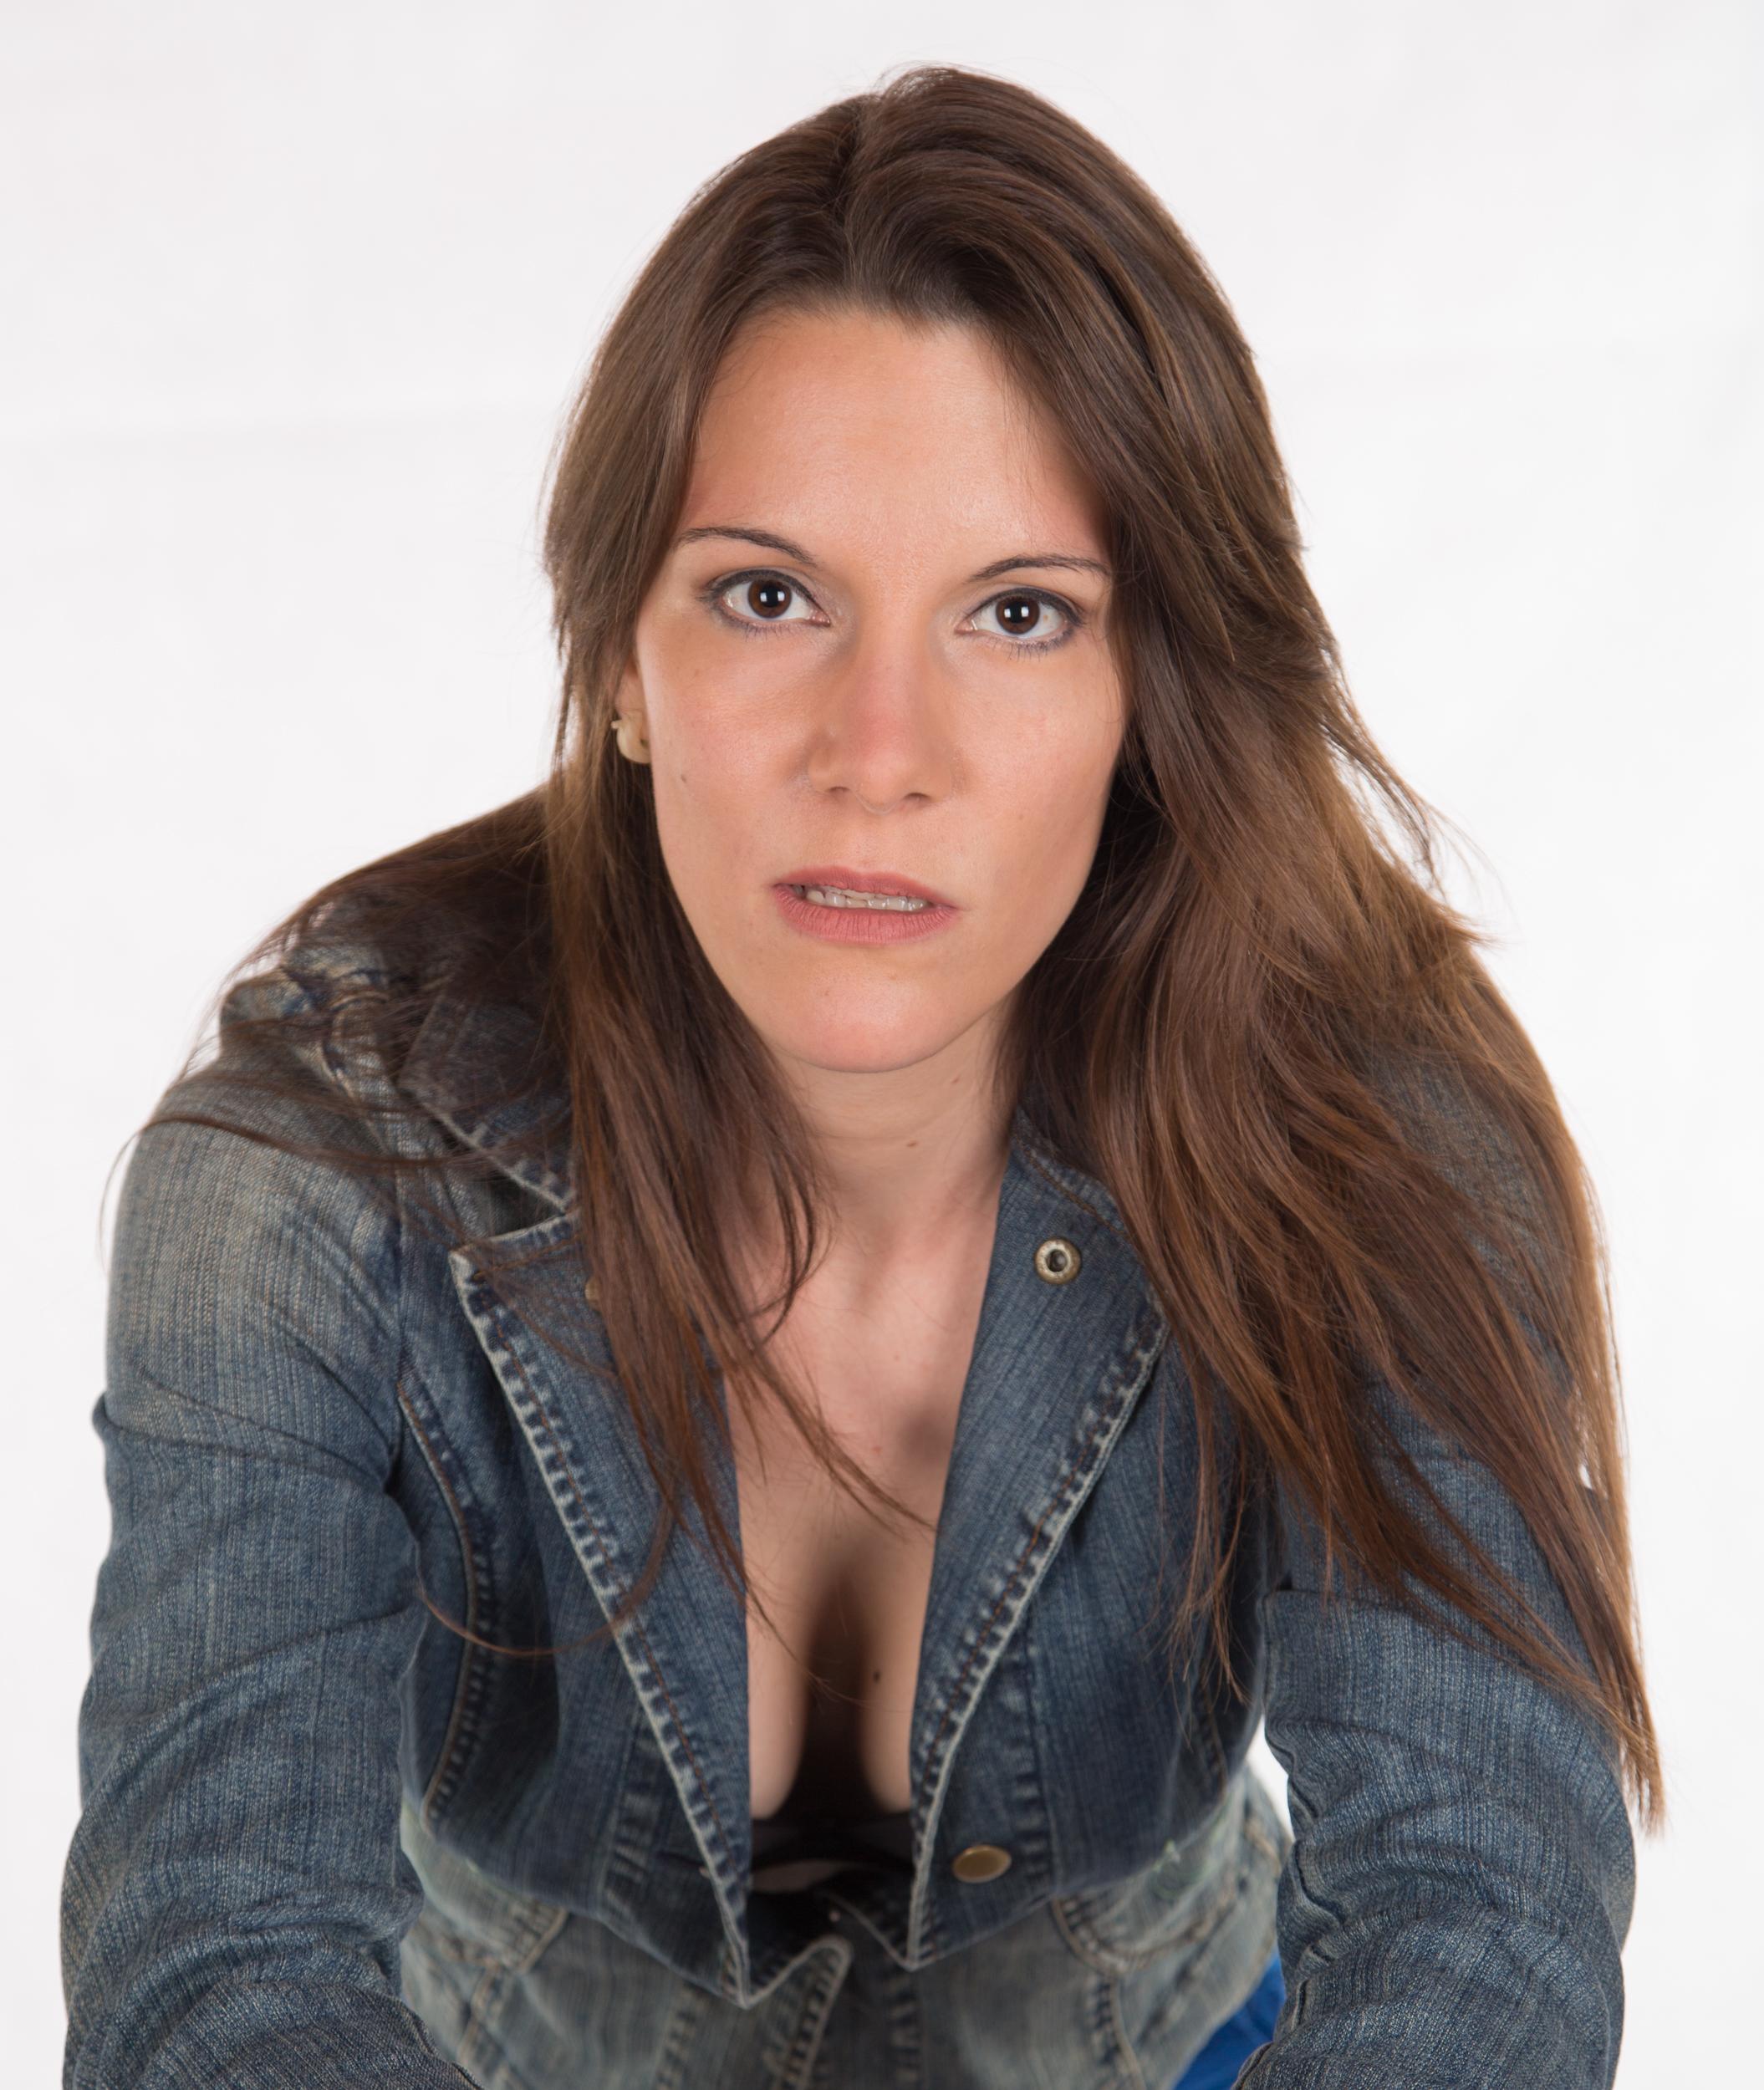 Monica Solé